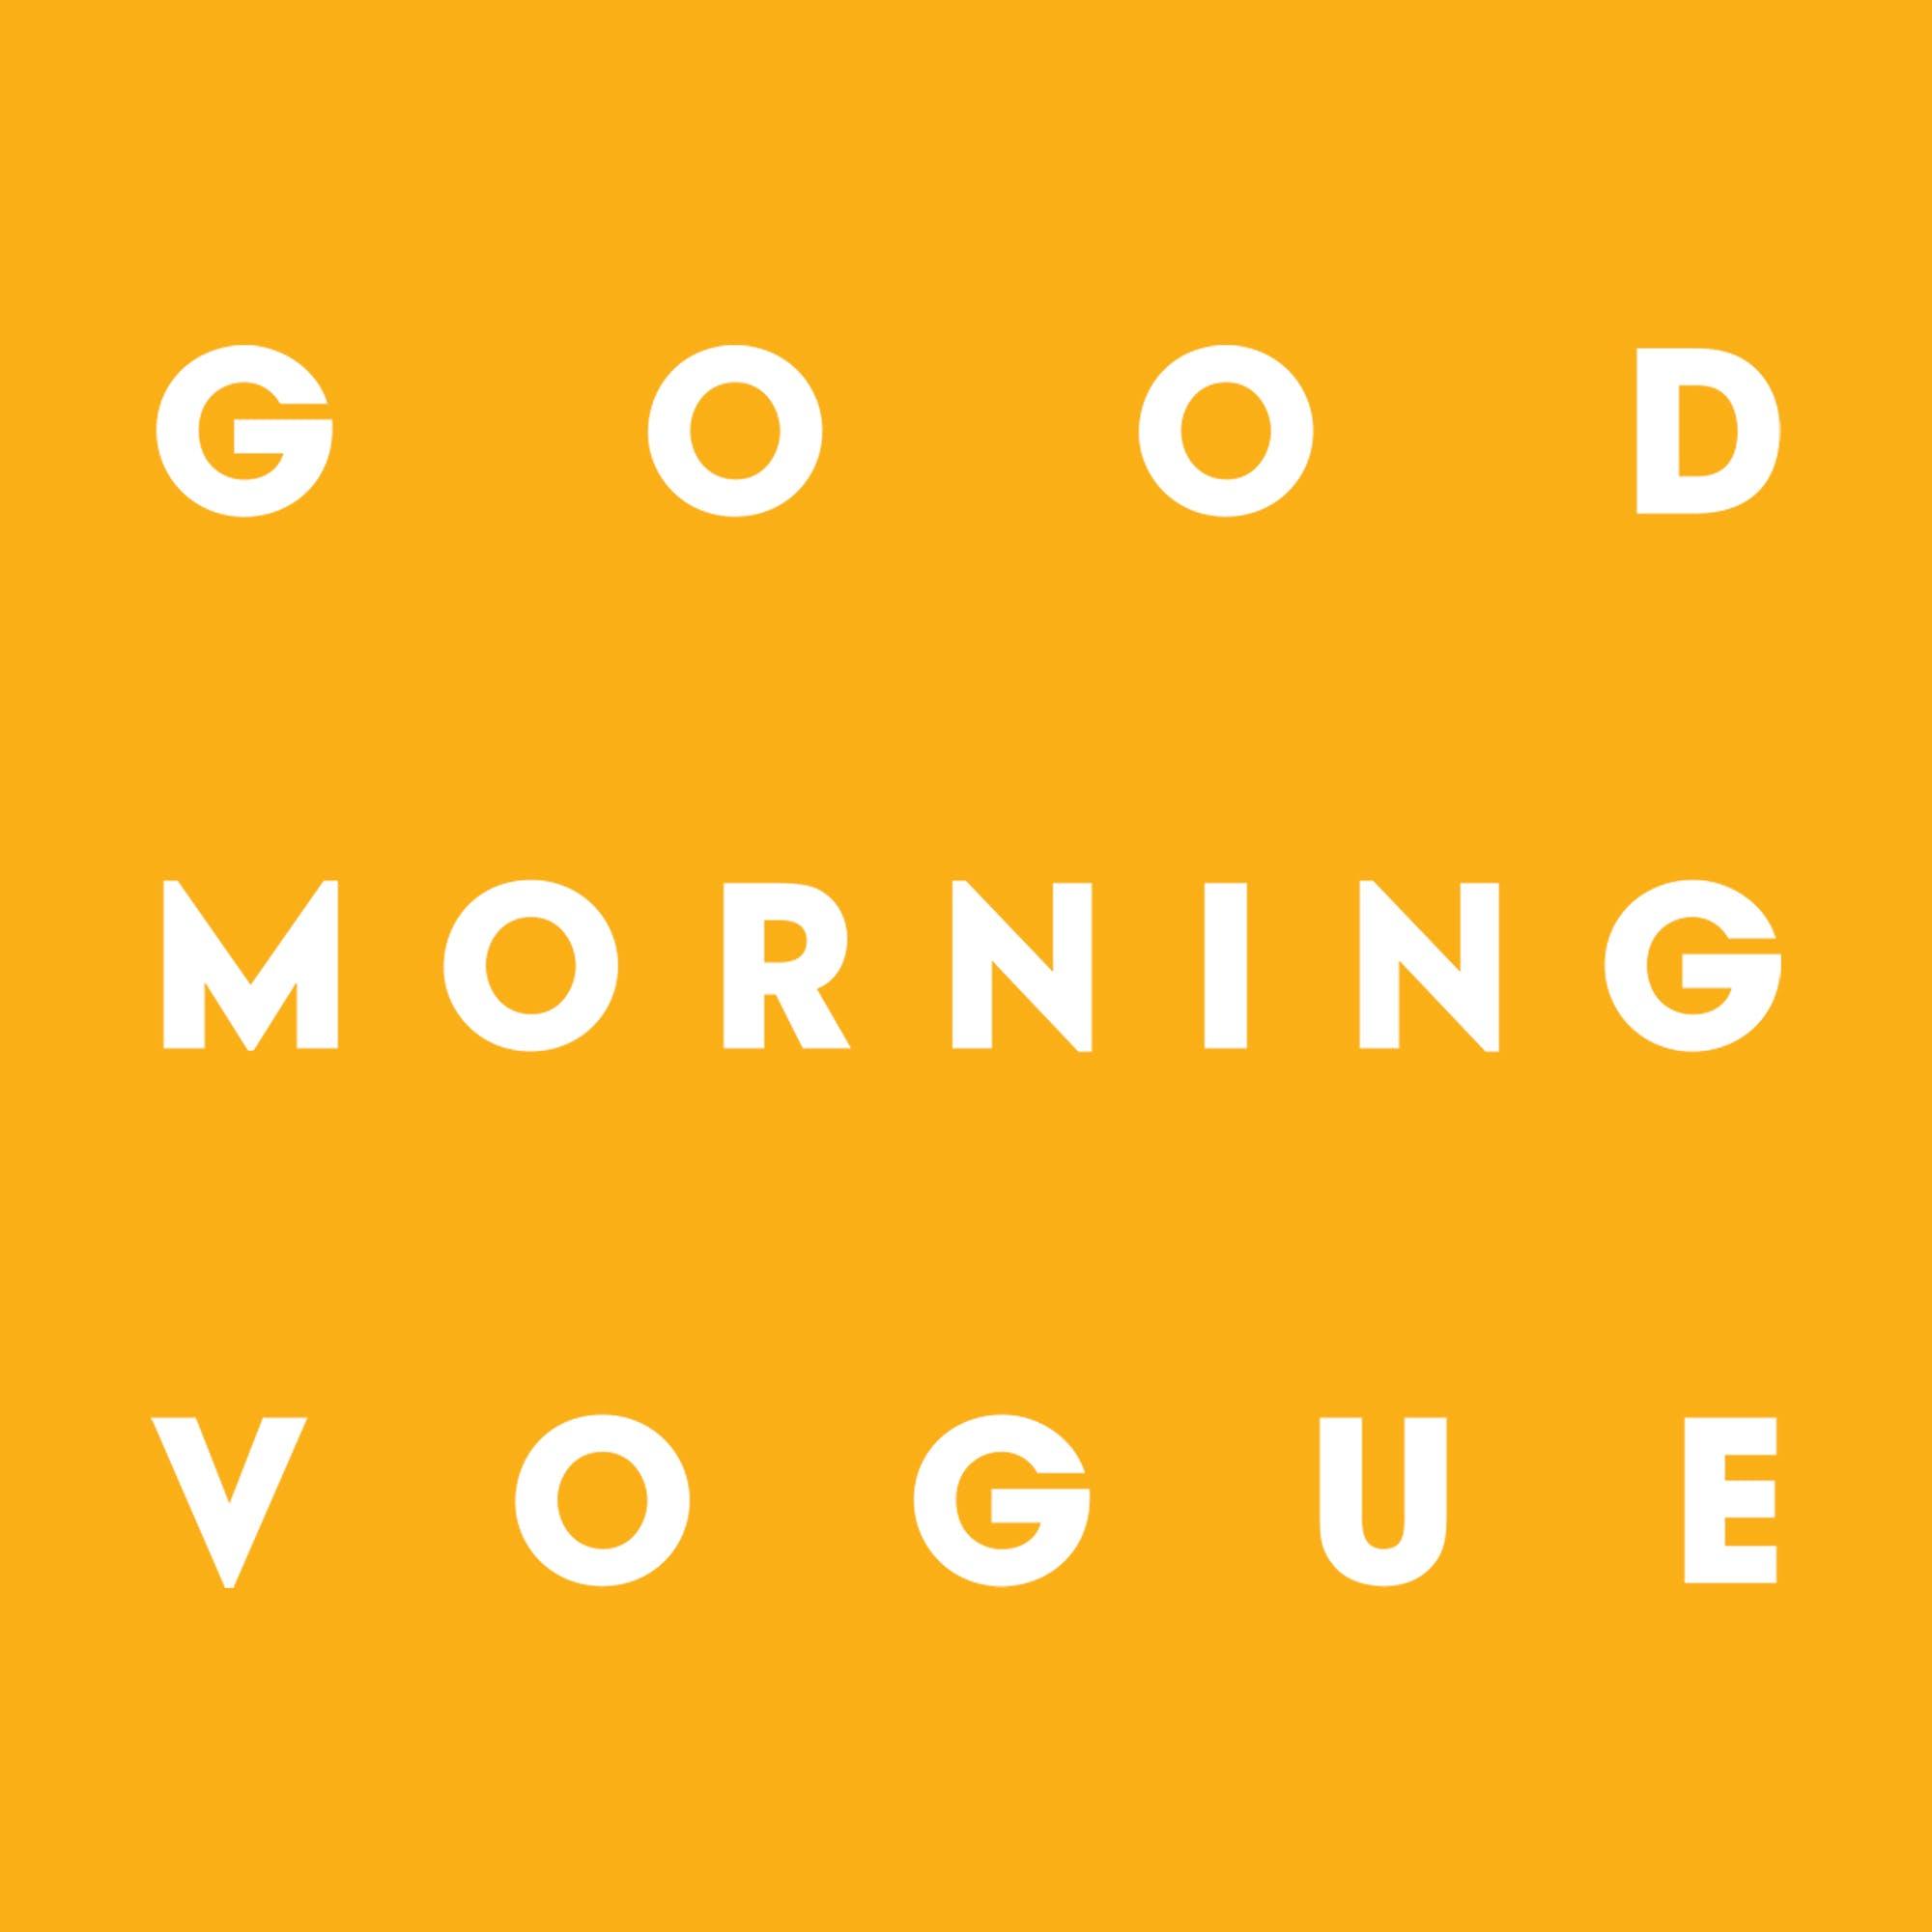 Good Morning Vogue: Simone Rocha Is Bringing Femininity and Frills to the Mainstream